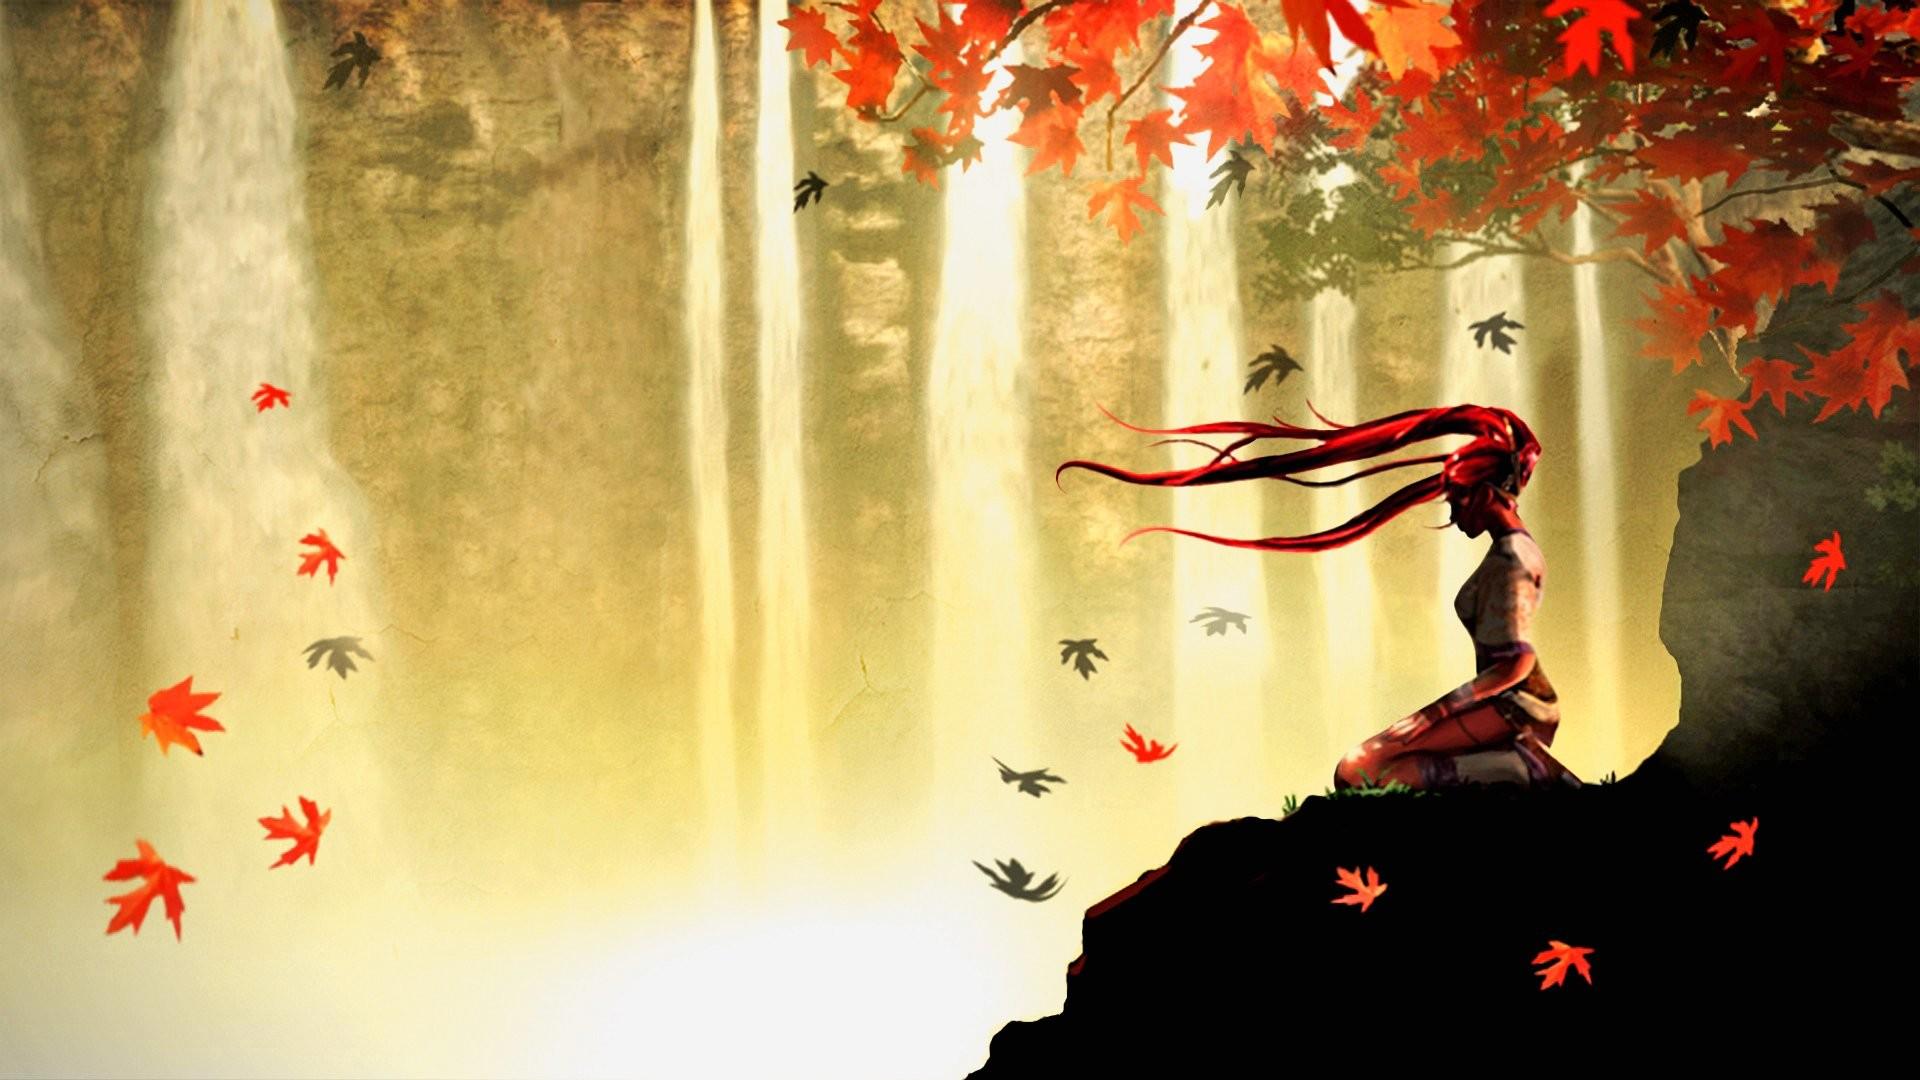 Wallpaper autumn meditation anime 1920 x 1080 full hd